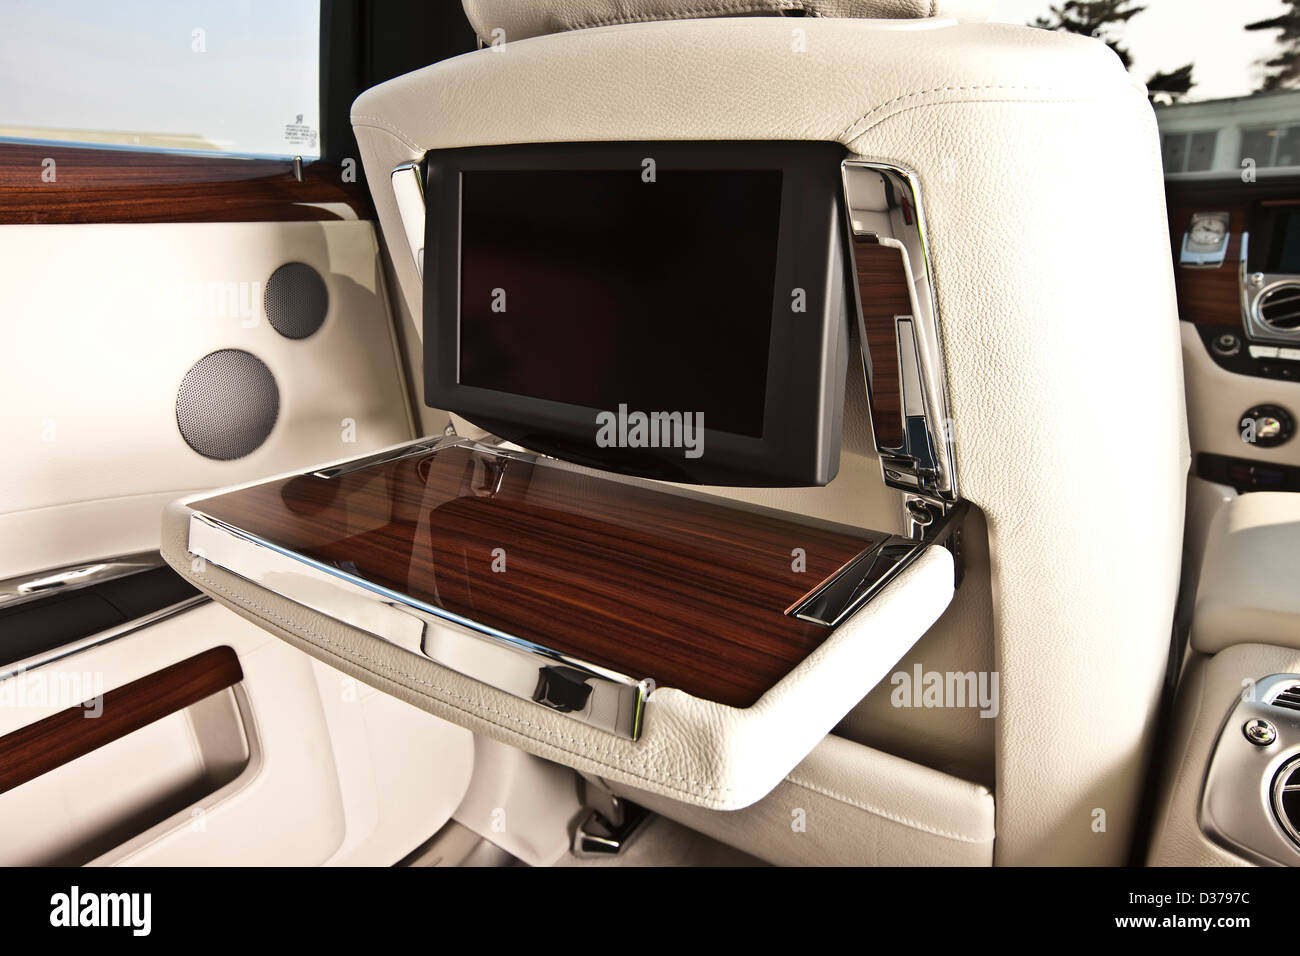 Concealed plasma screen in seat back, Rolls Royce Ghost luxury saloon car, Goodwood, UK, 15 04 2010 - Stock Image